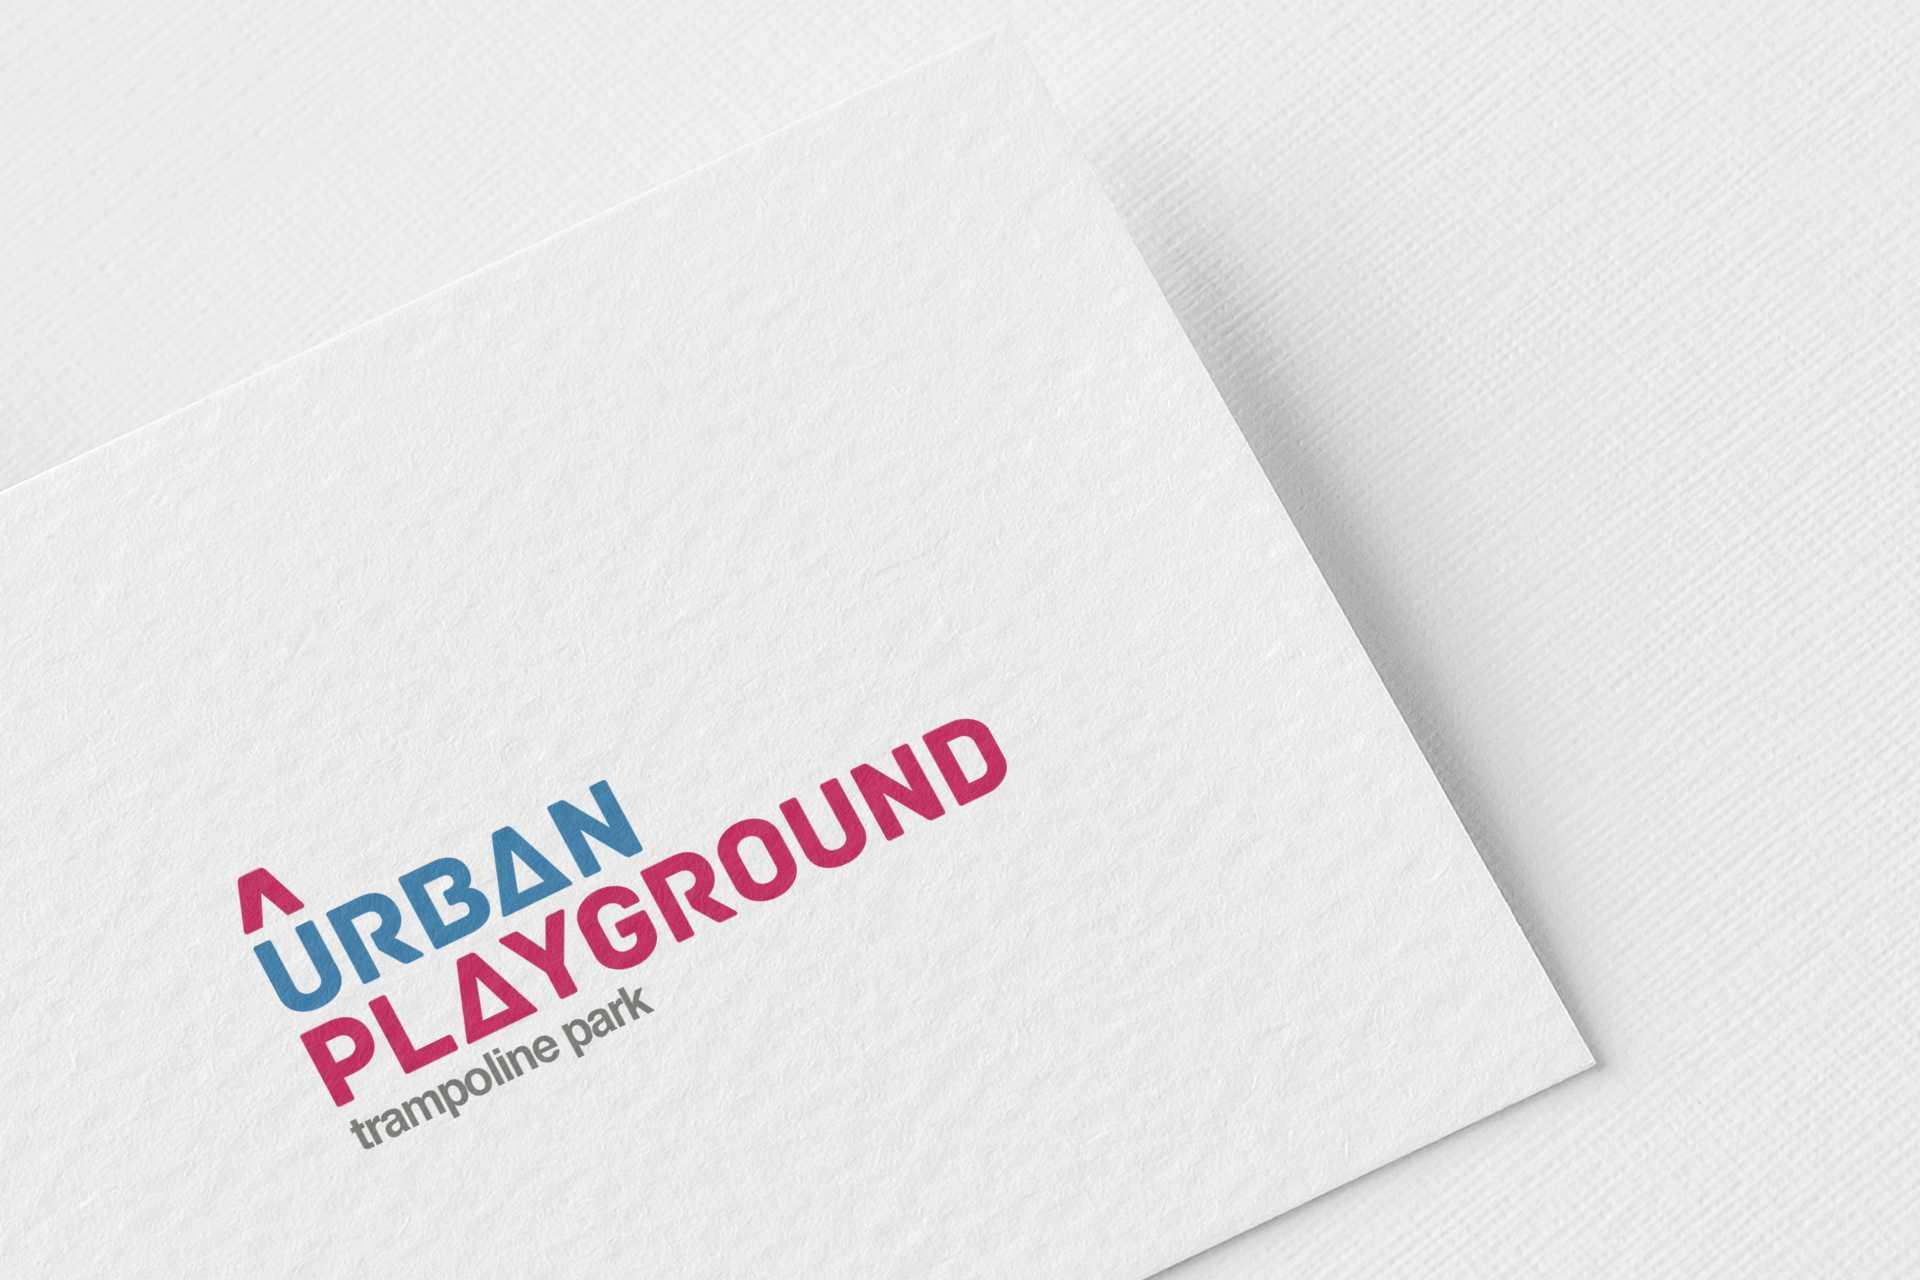 pixel-perfect-warrington-urban-playground-logo-design